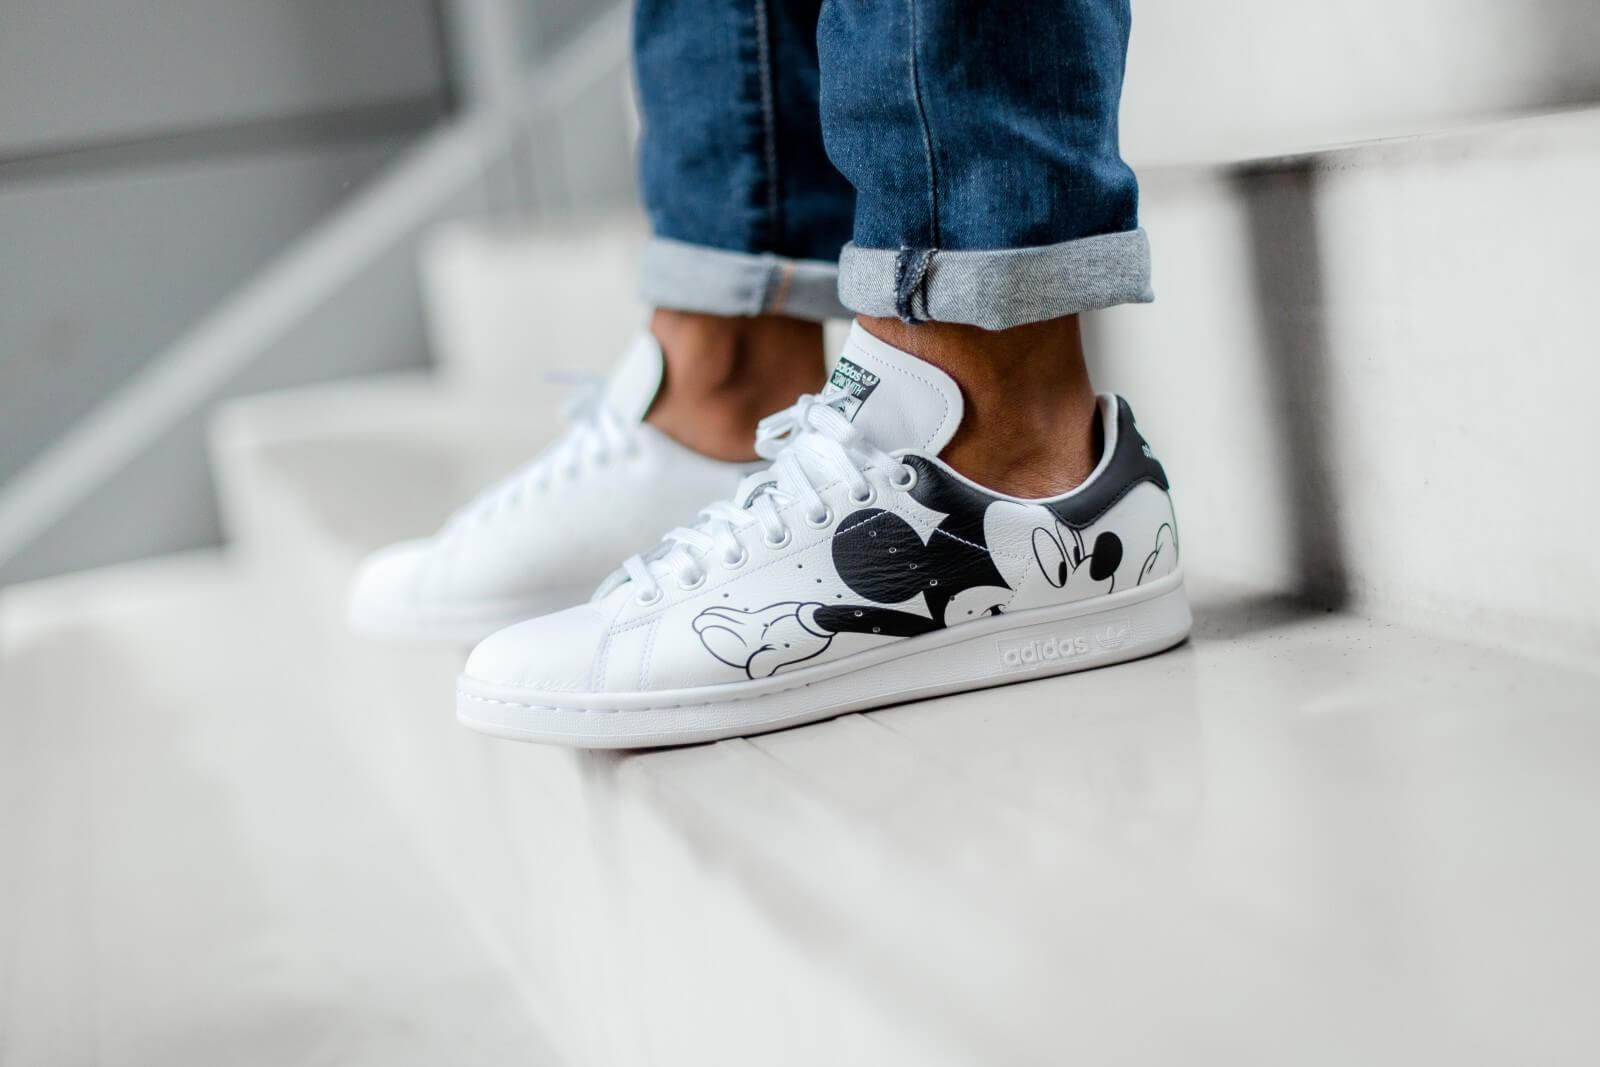 Adidas x Disney Stan Smith Footwear White/Core Black